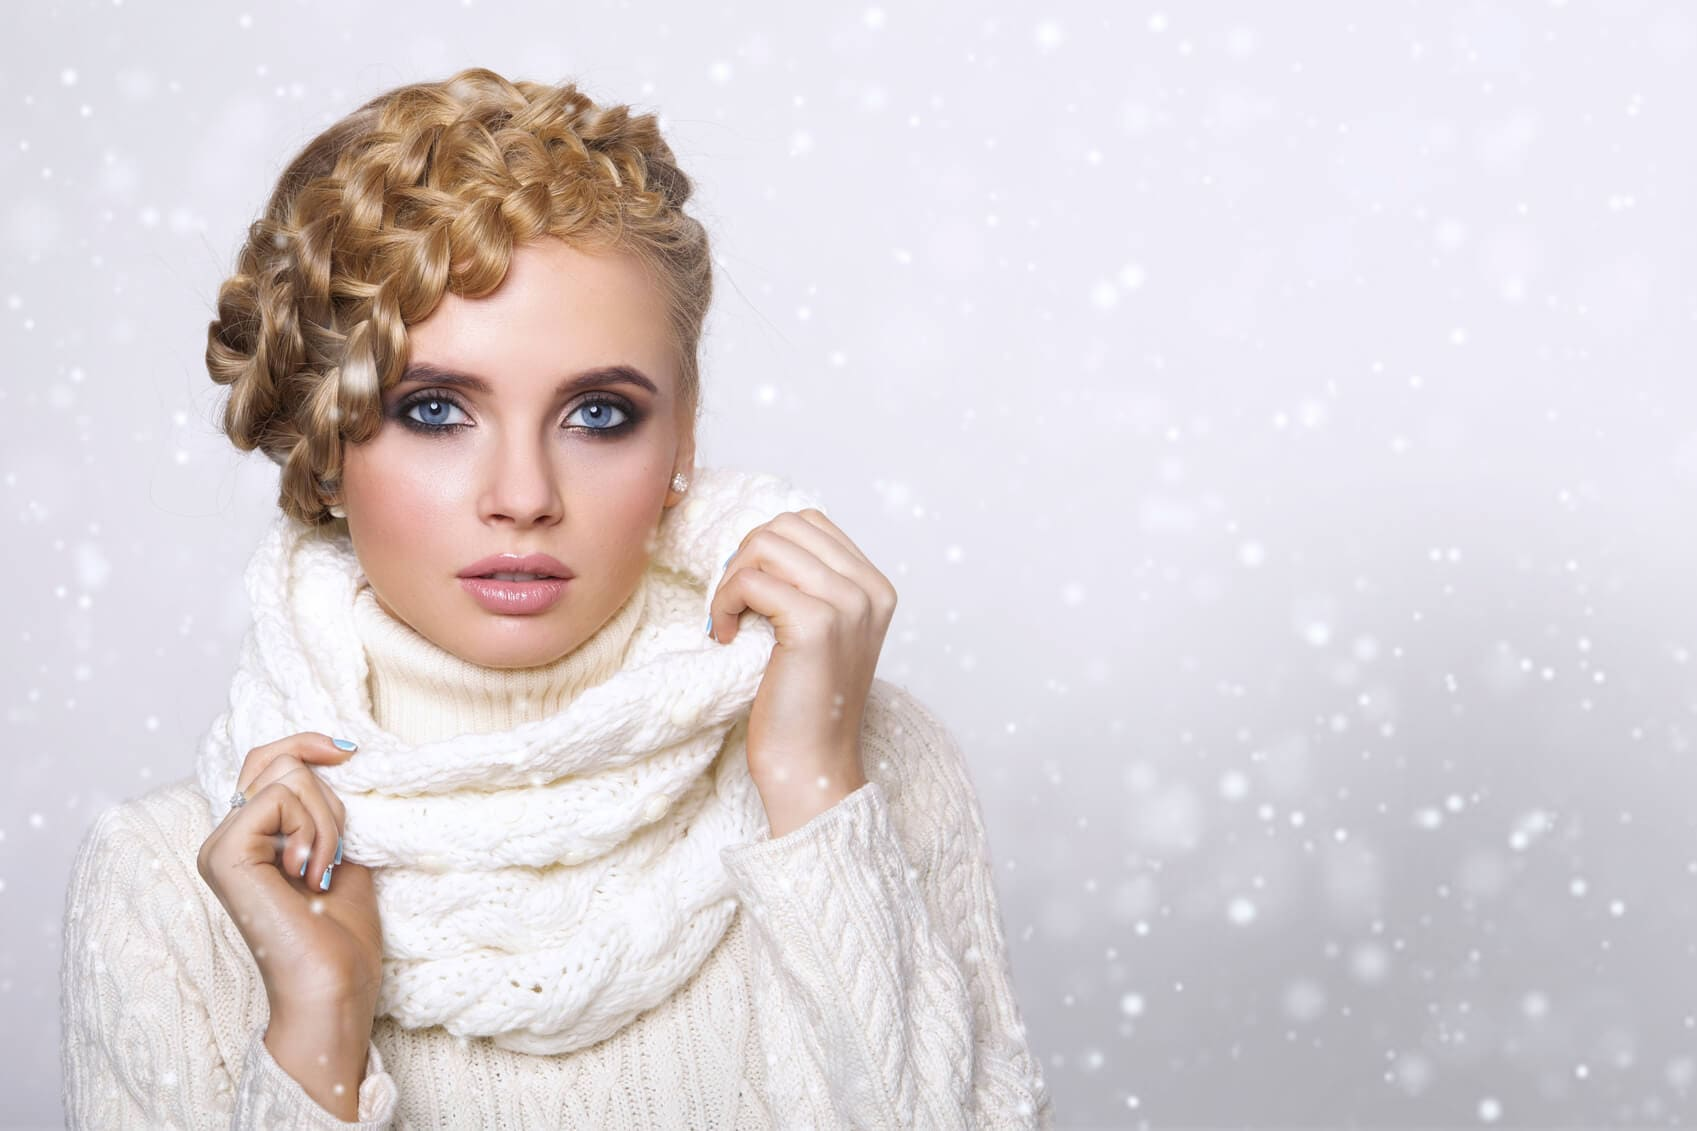 7 Stunning Winter Wedding Hairstyles